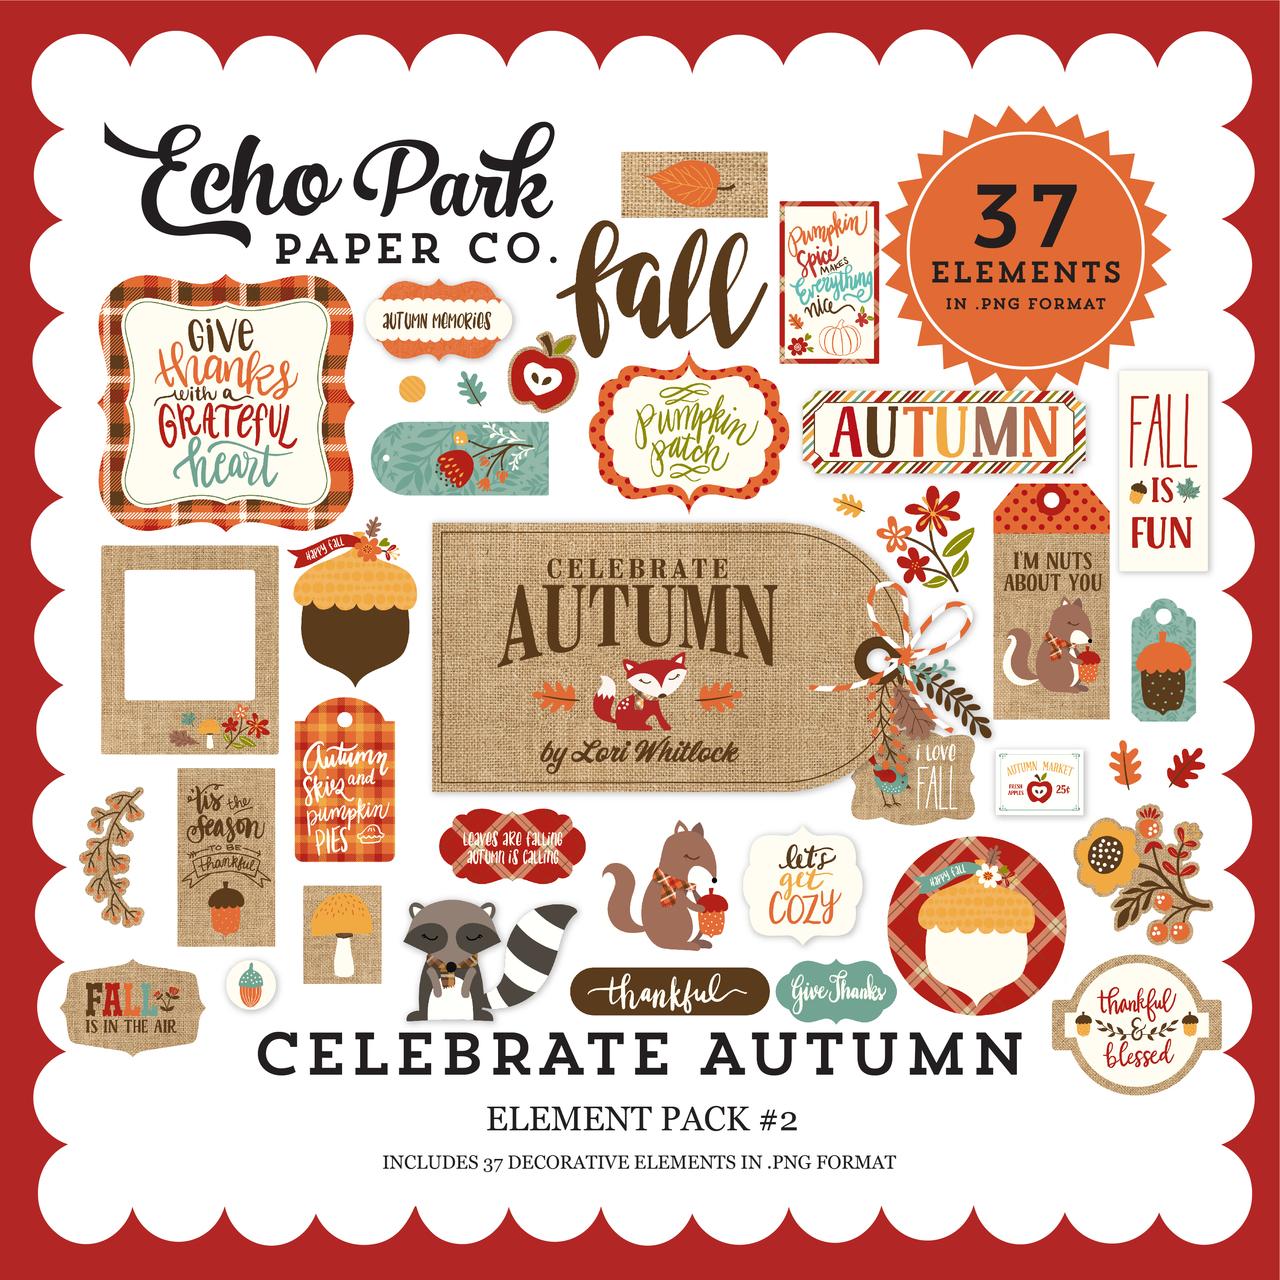 Celebrate Autumn Element Pack #2